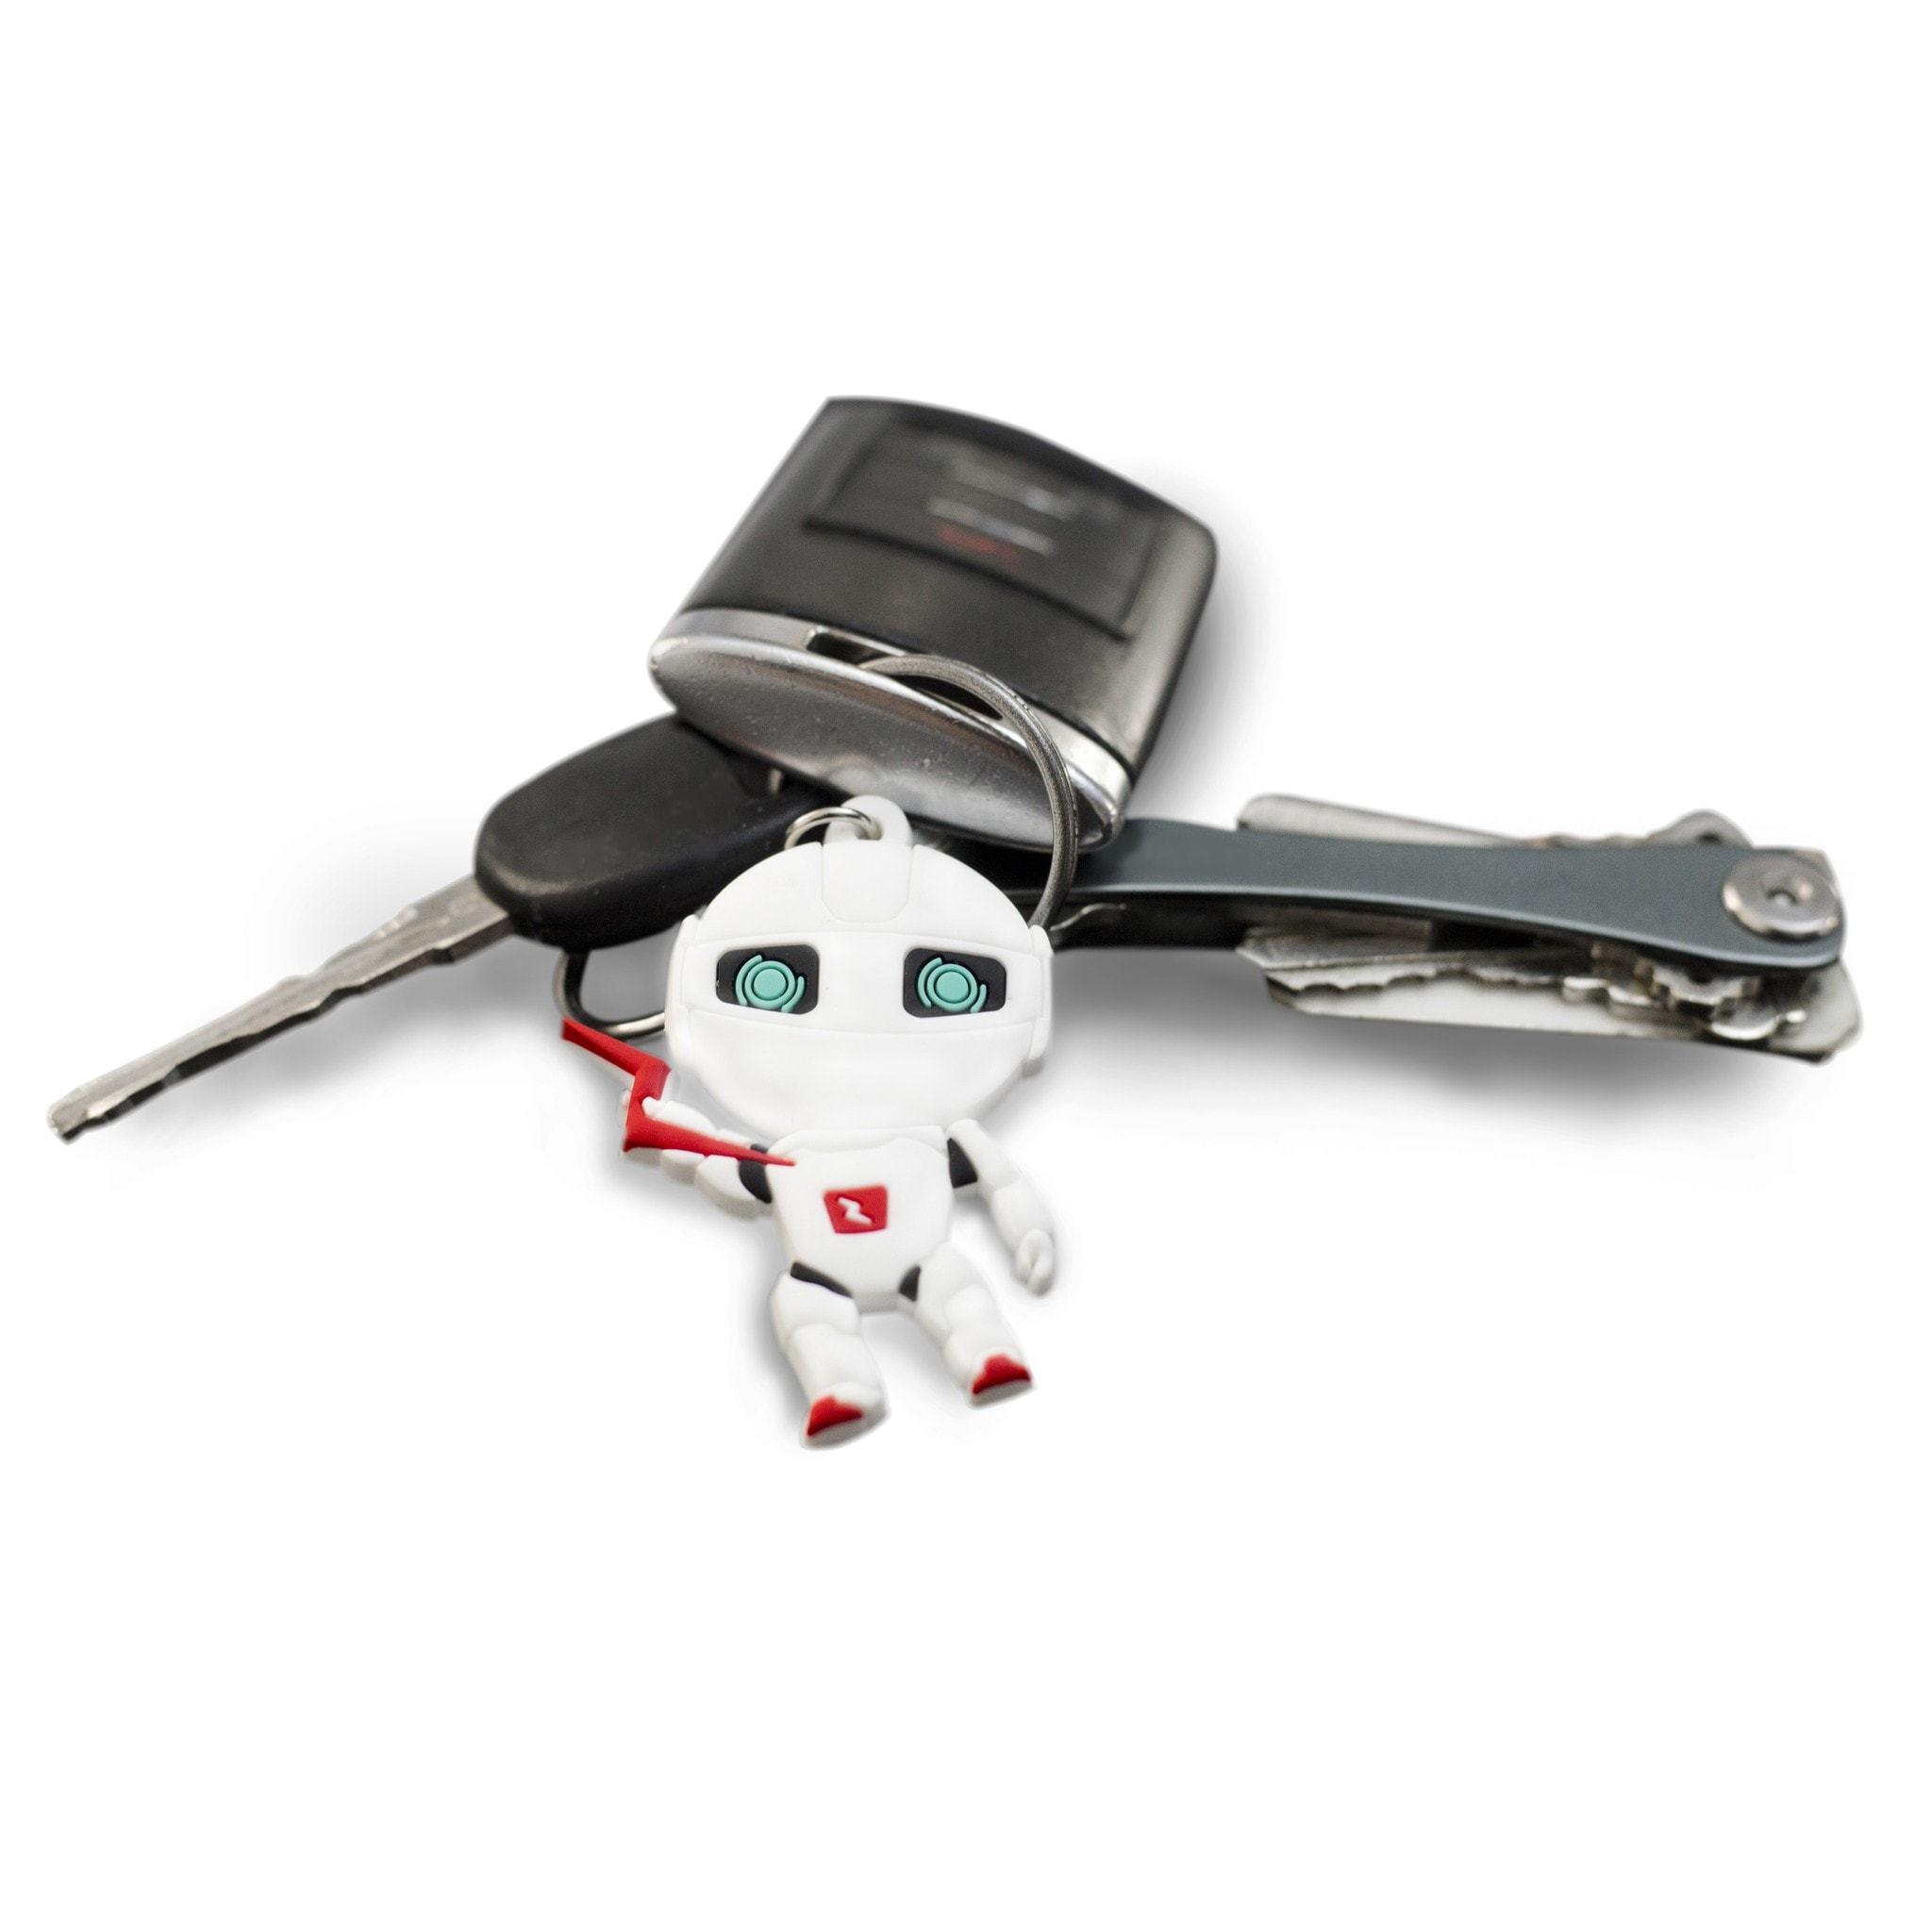 Zizo Bolt Key chain Limited Edition